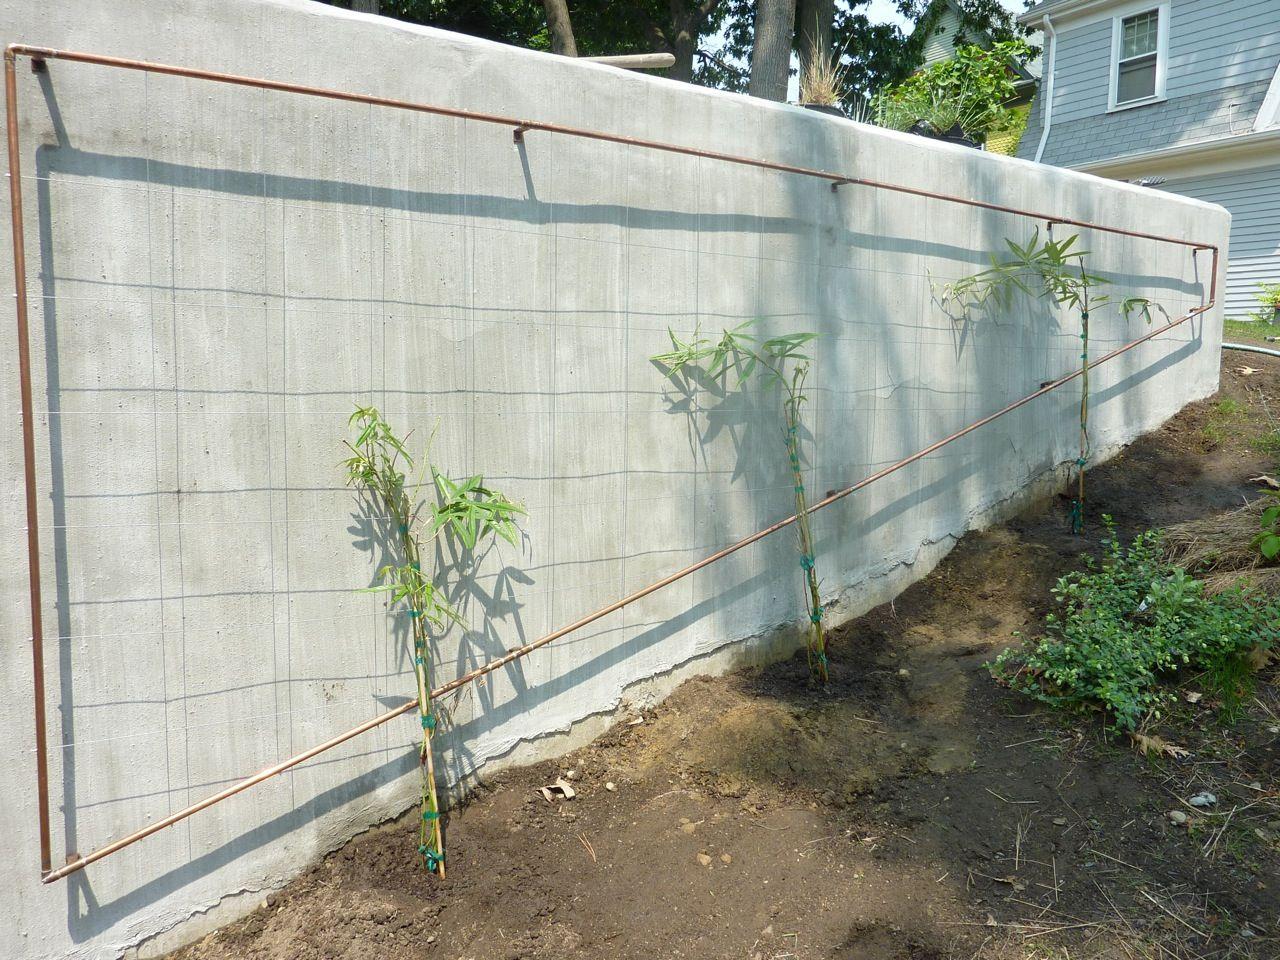 Trellising Wire Against Wall